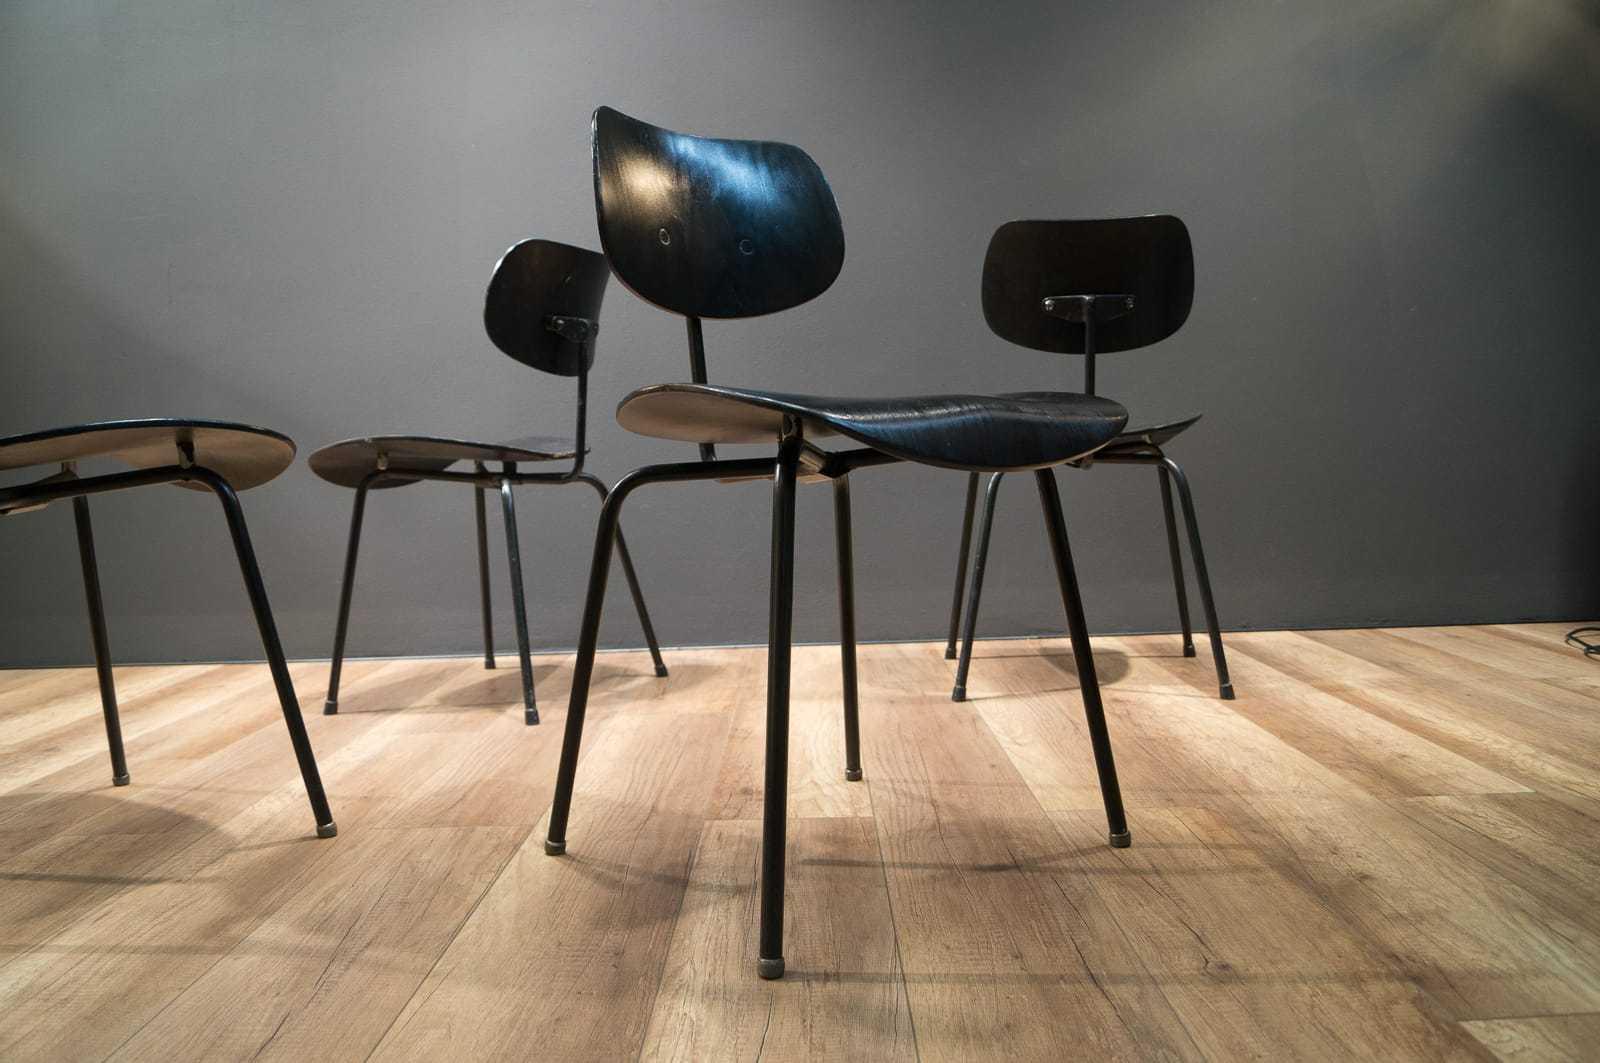 4er set wilde spieth st hle stuhl se68 egon eiermann se 68 chair ebay. Black Bedroom Furniture Sets. Home Design Ideas